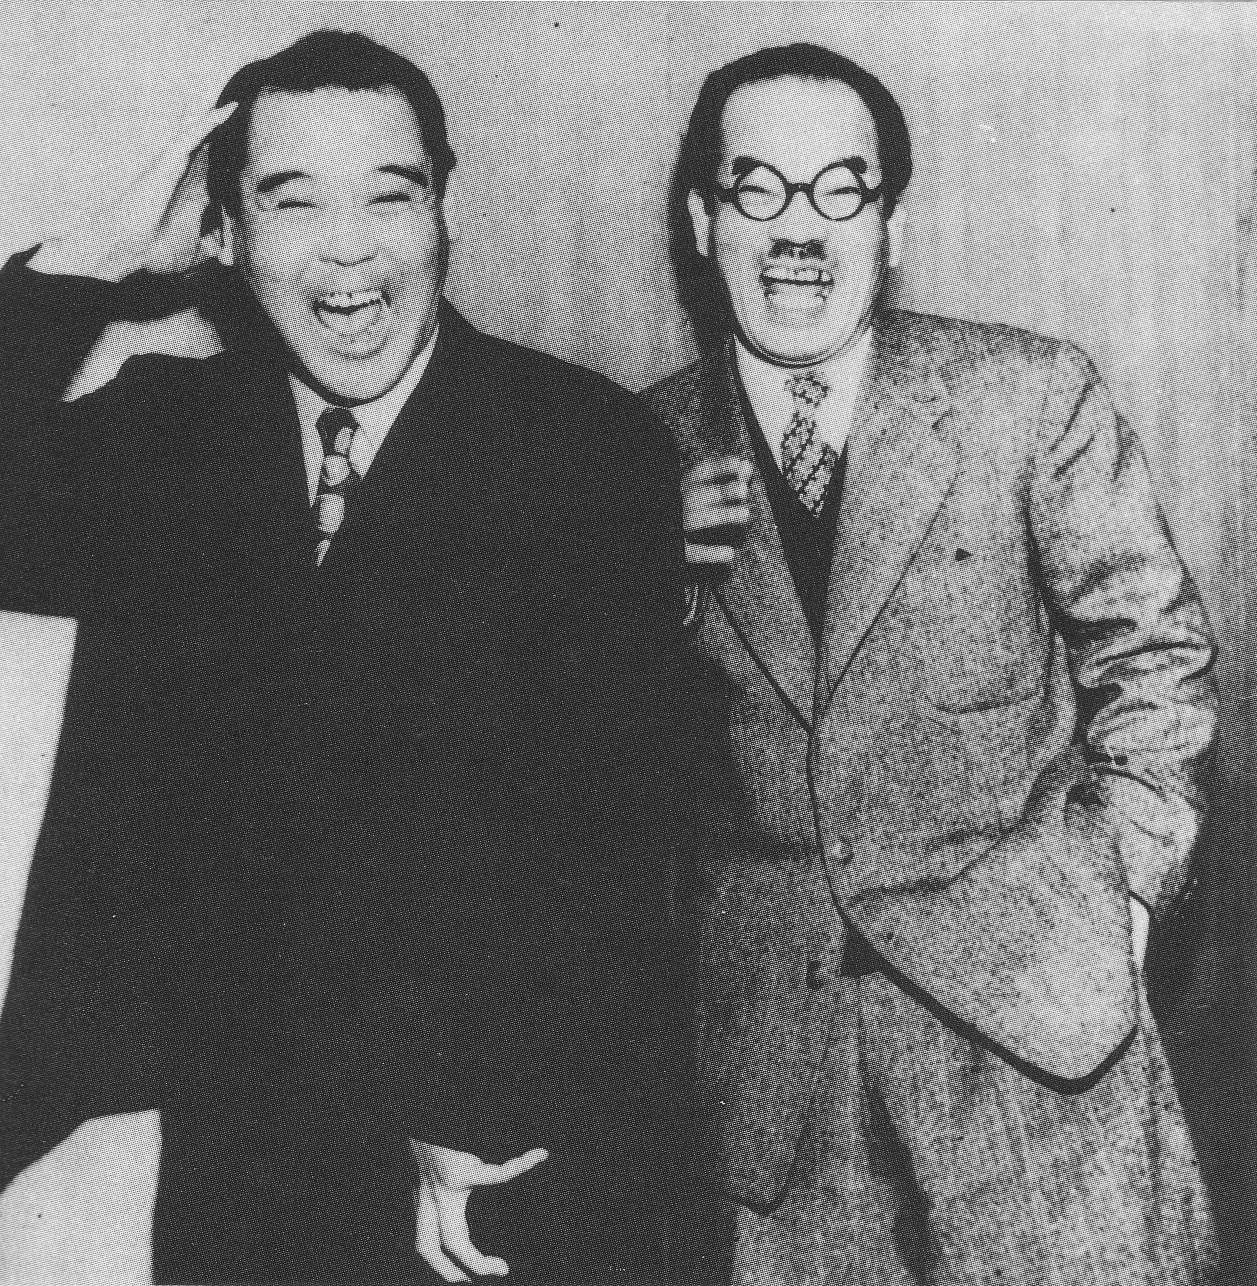 https://upload.wikimedia.org/wikipedia/commons/d/de/Entatsu_Achako_Scan10036.JPG